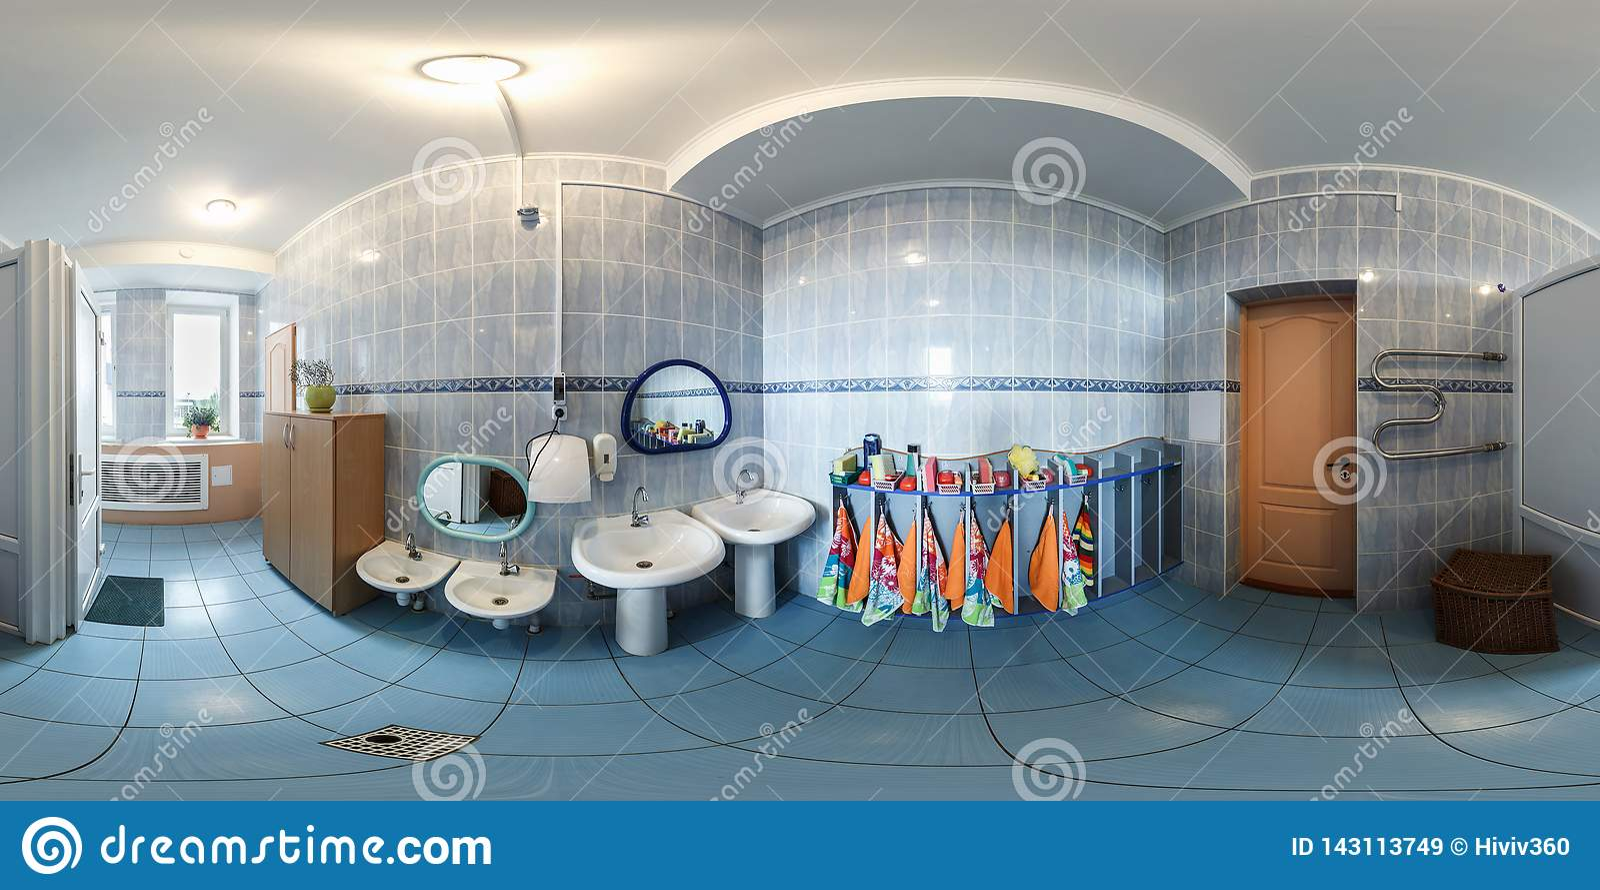 GRODNO, BELARUS - APRIL, 2016: Full seamless panorama 360 angle degrees inside interior small bathroom in vintage kindergarten in